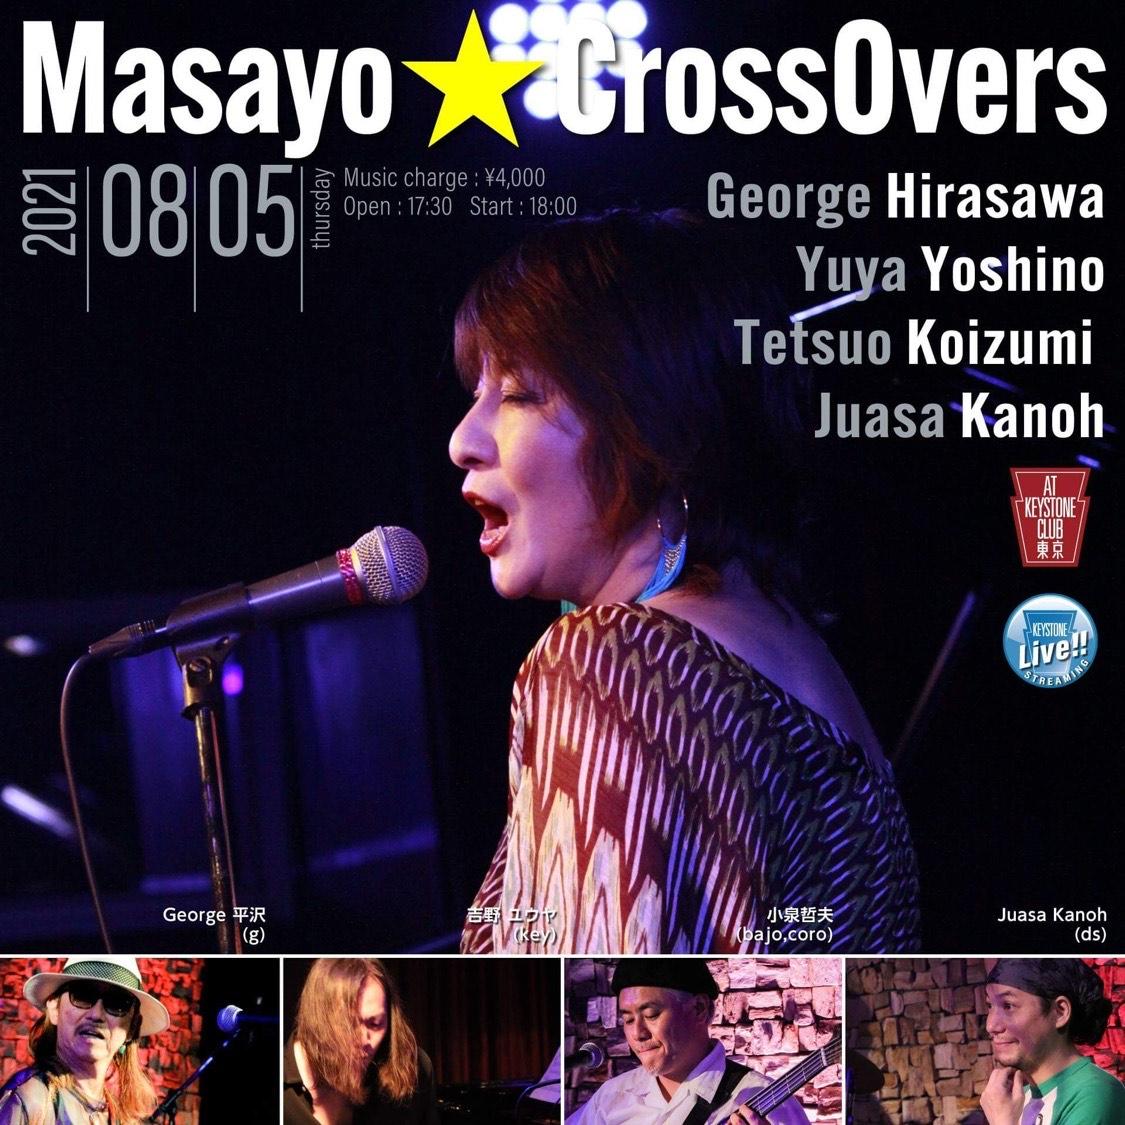 Masayo★CrossOvers